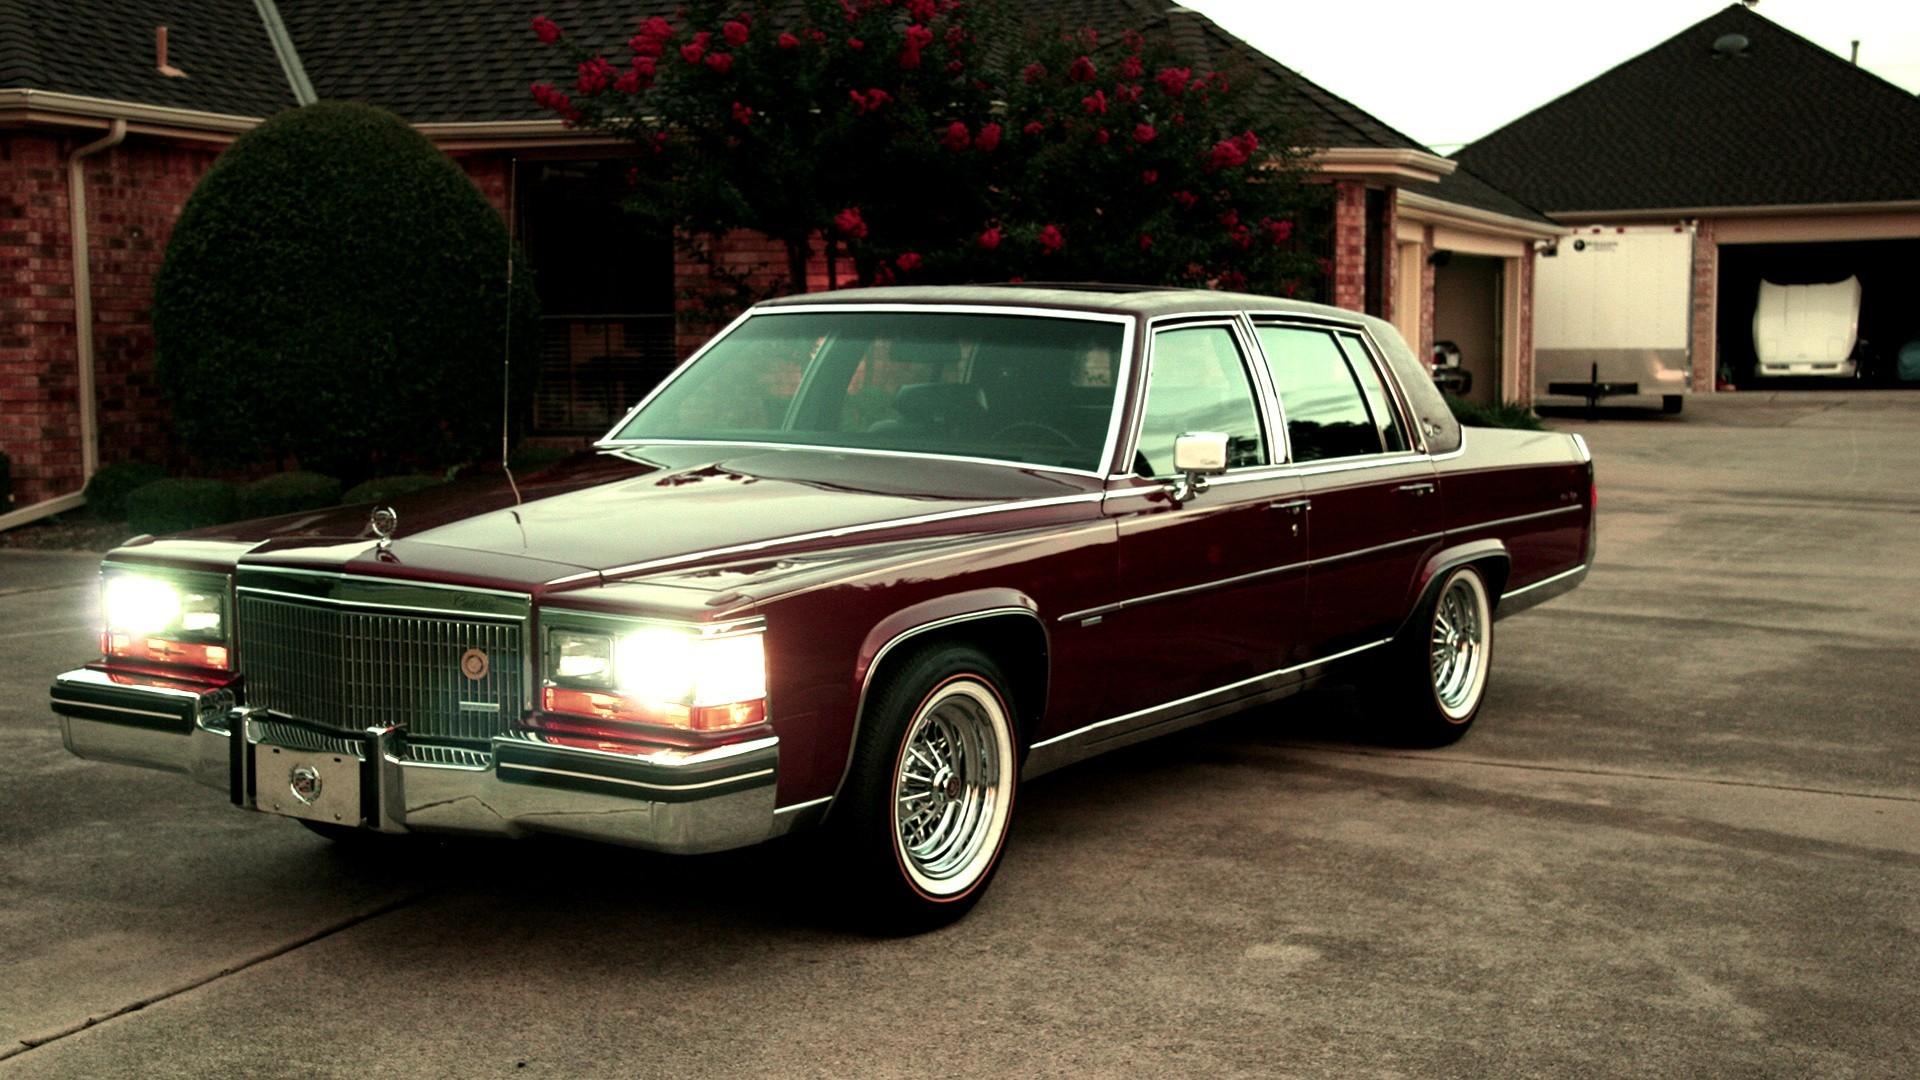 Classic Cadillac Wallpaper 71 Images